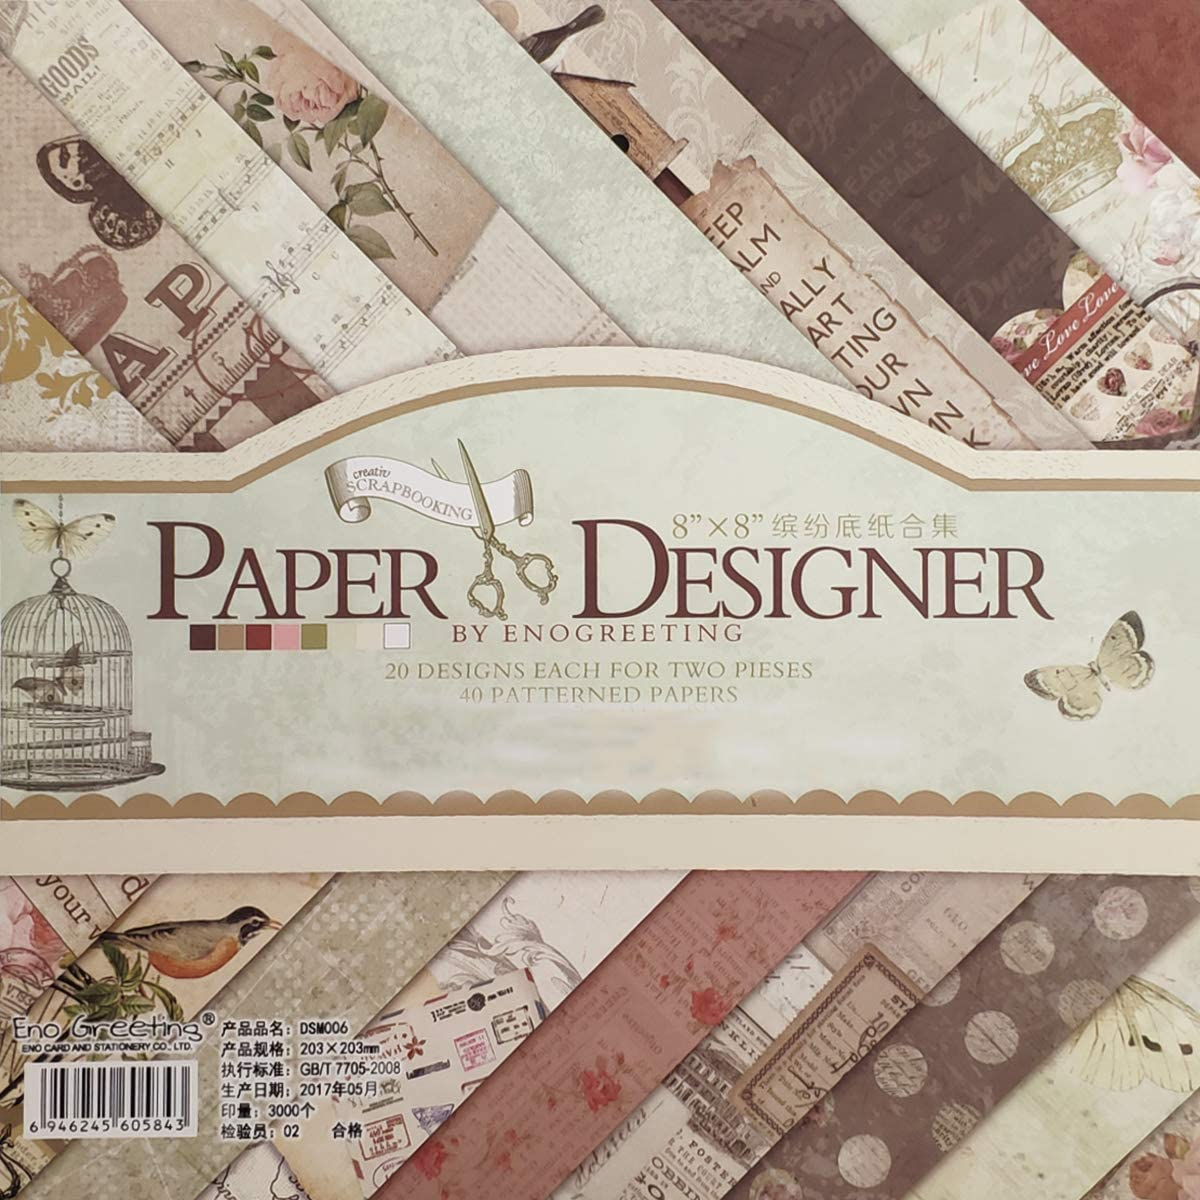 levylisa 8x8 Cardstock Paper Pad Designer Paper Pad Floral Scrapbook Paper Decorative Craft Paper (40 Sheets) (006)